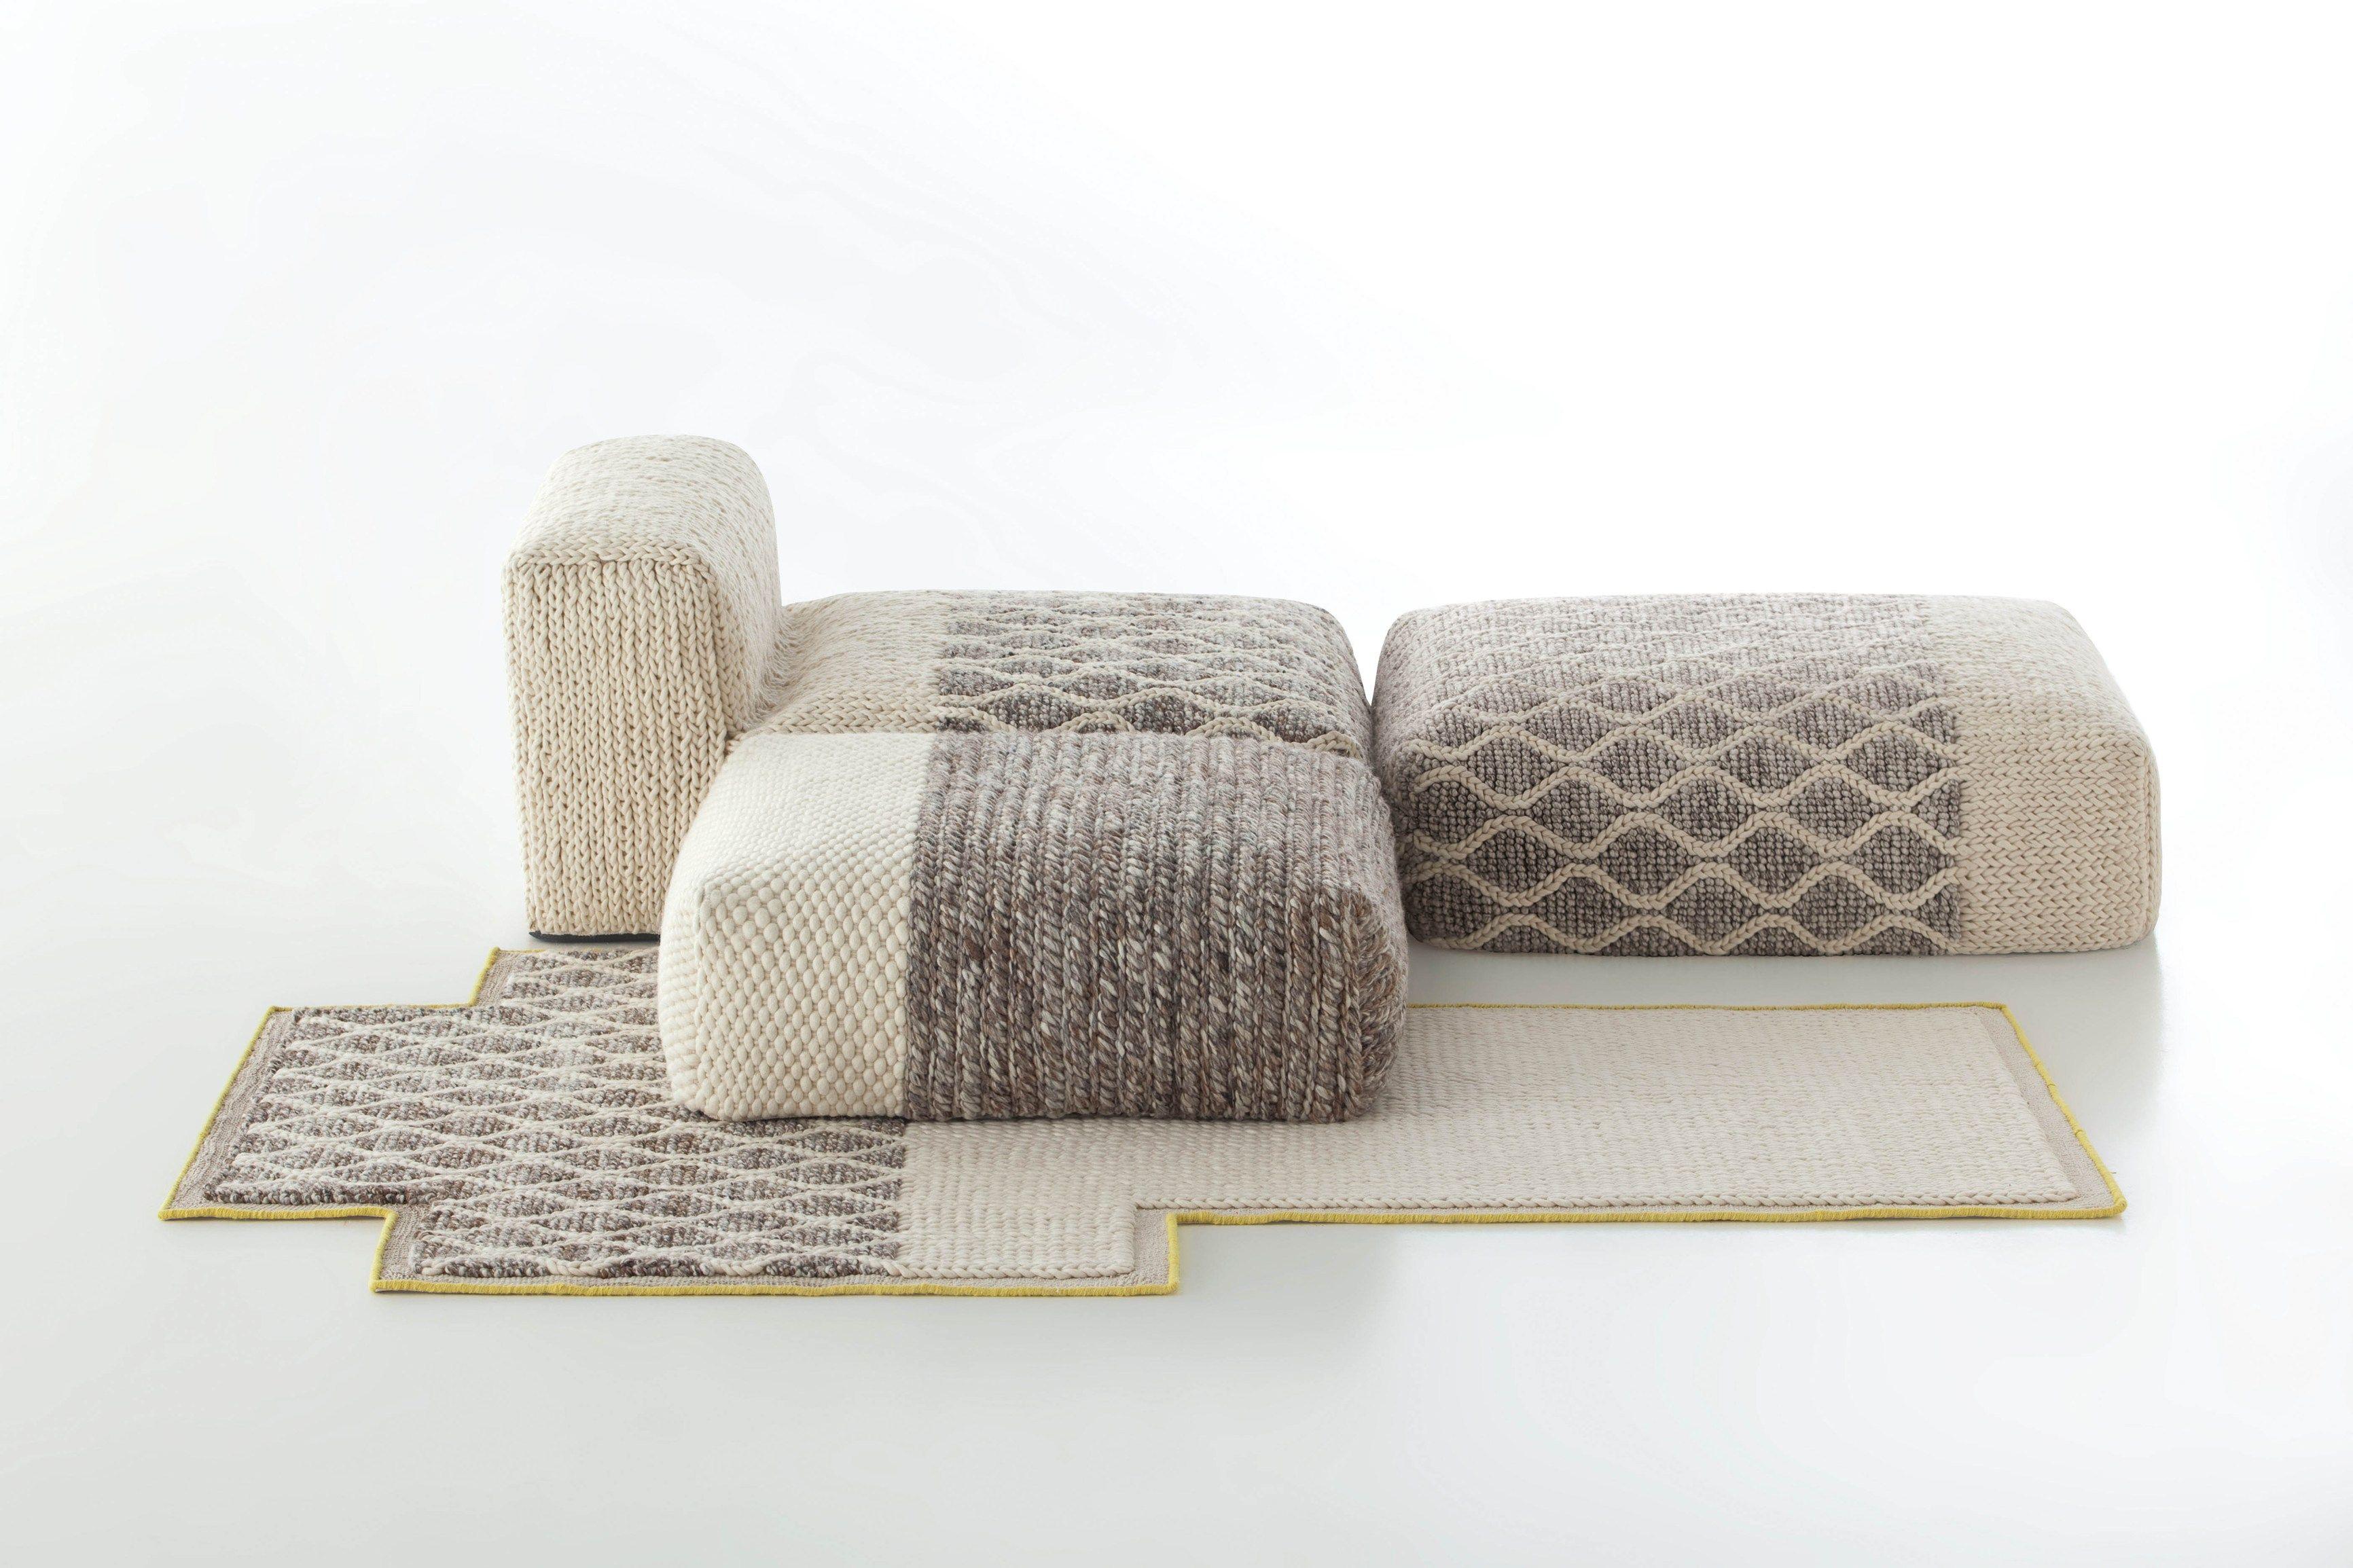 mangas spaces rug by gan by gandia blasco design patricia urquiola. Black Bedroom Furniture Sets. Home Design Ideas